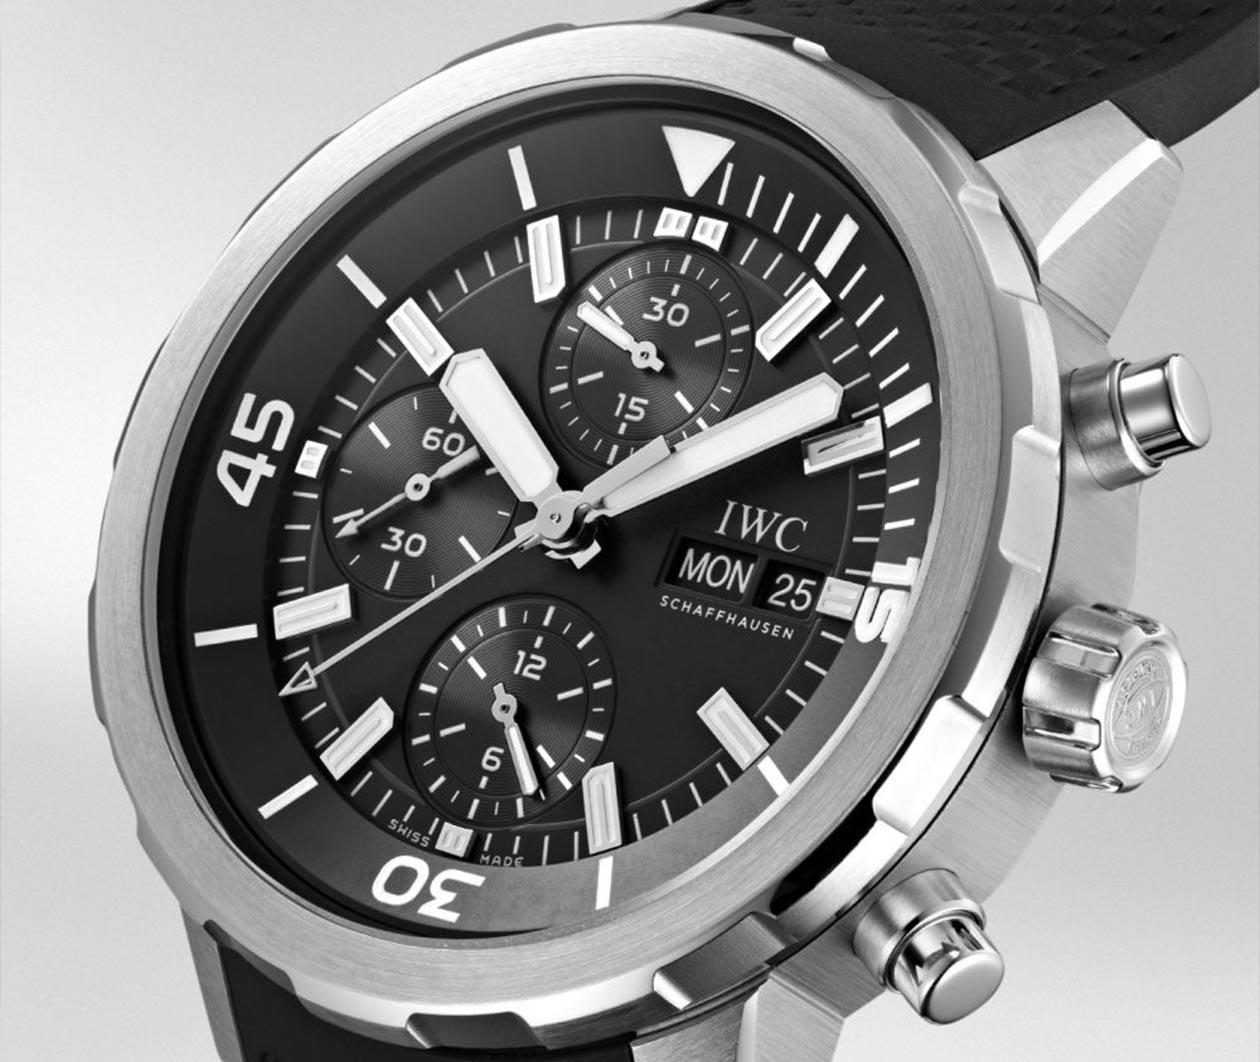 IWC Aquatimer Chronograph IW376803 Carousel 3 FINAL